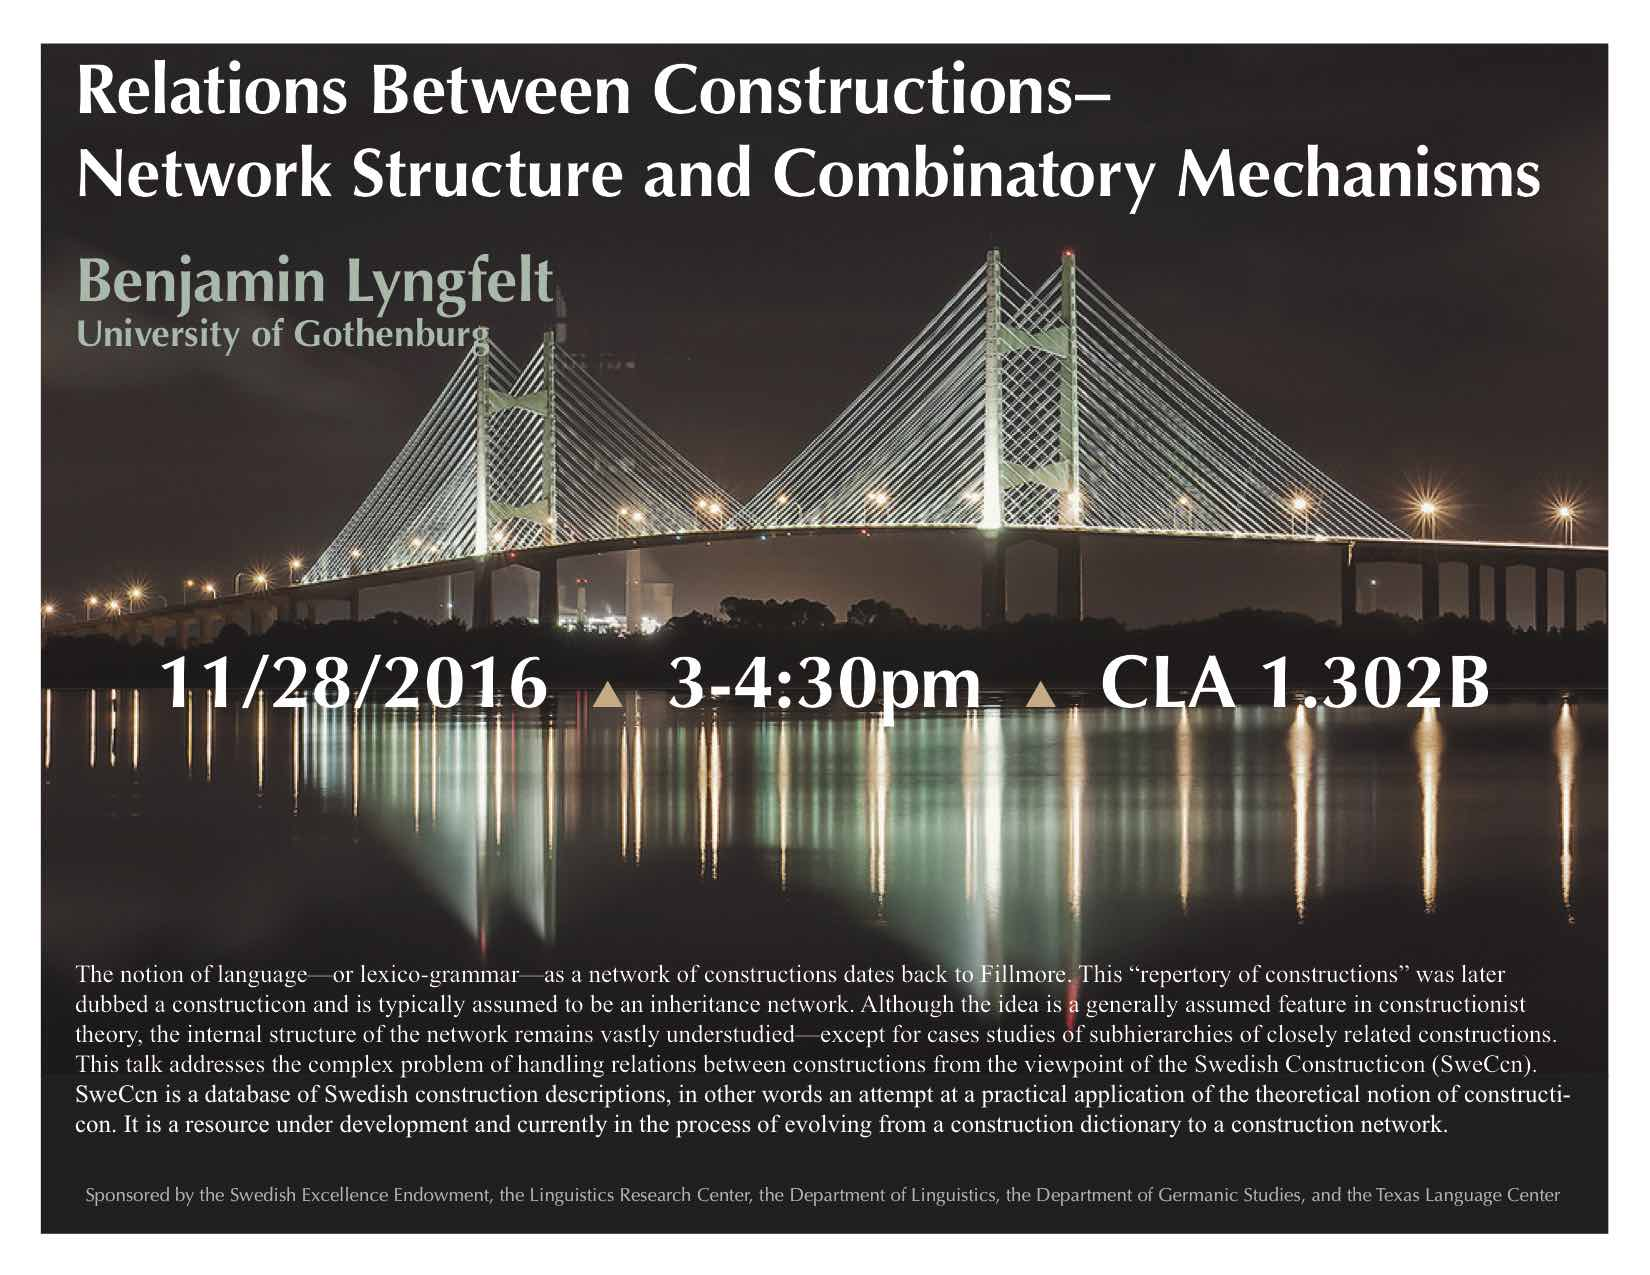 Prof. Lyngfelt discusses the Swedish Constructicon